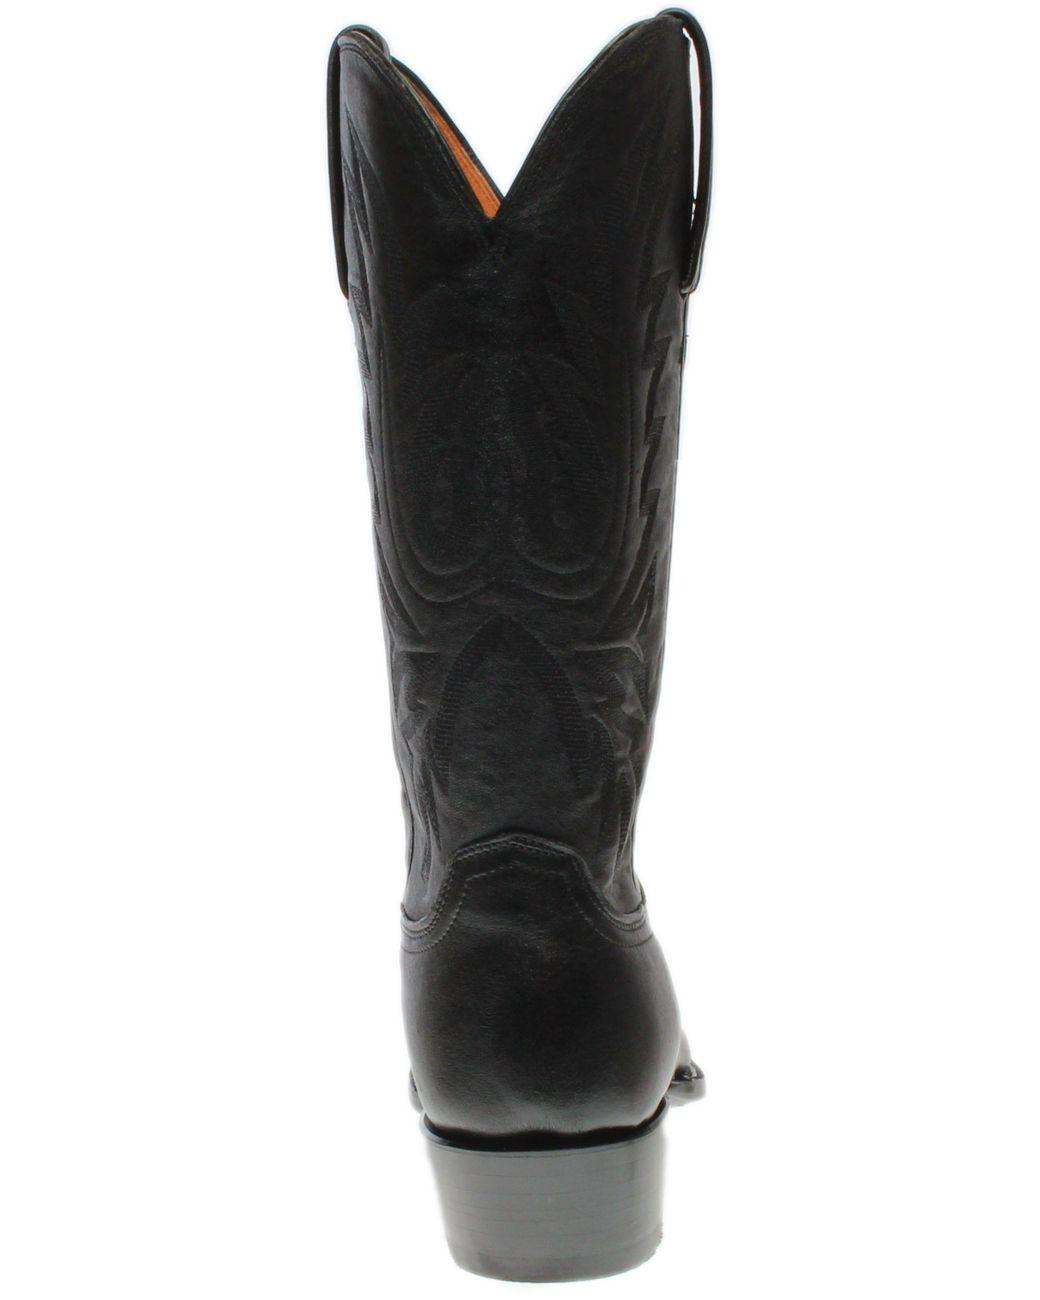 a3befb02adb Men's Black Carson Lonestar Calf Leather Boots